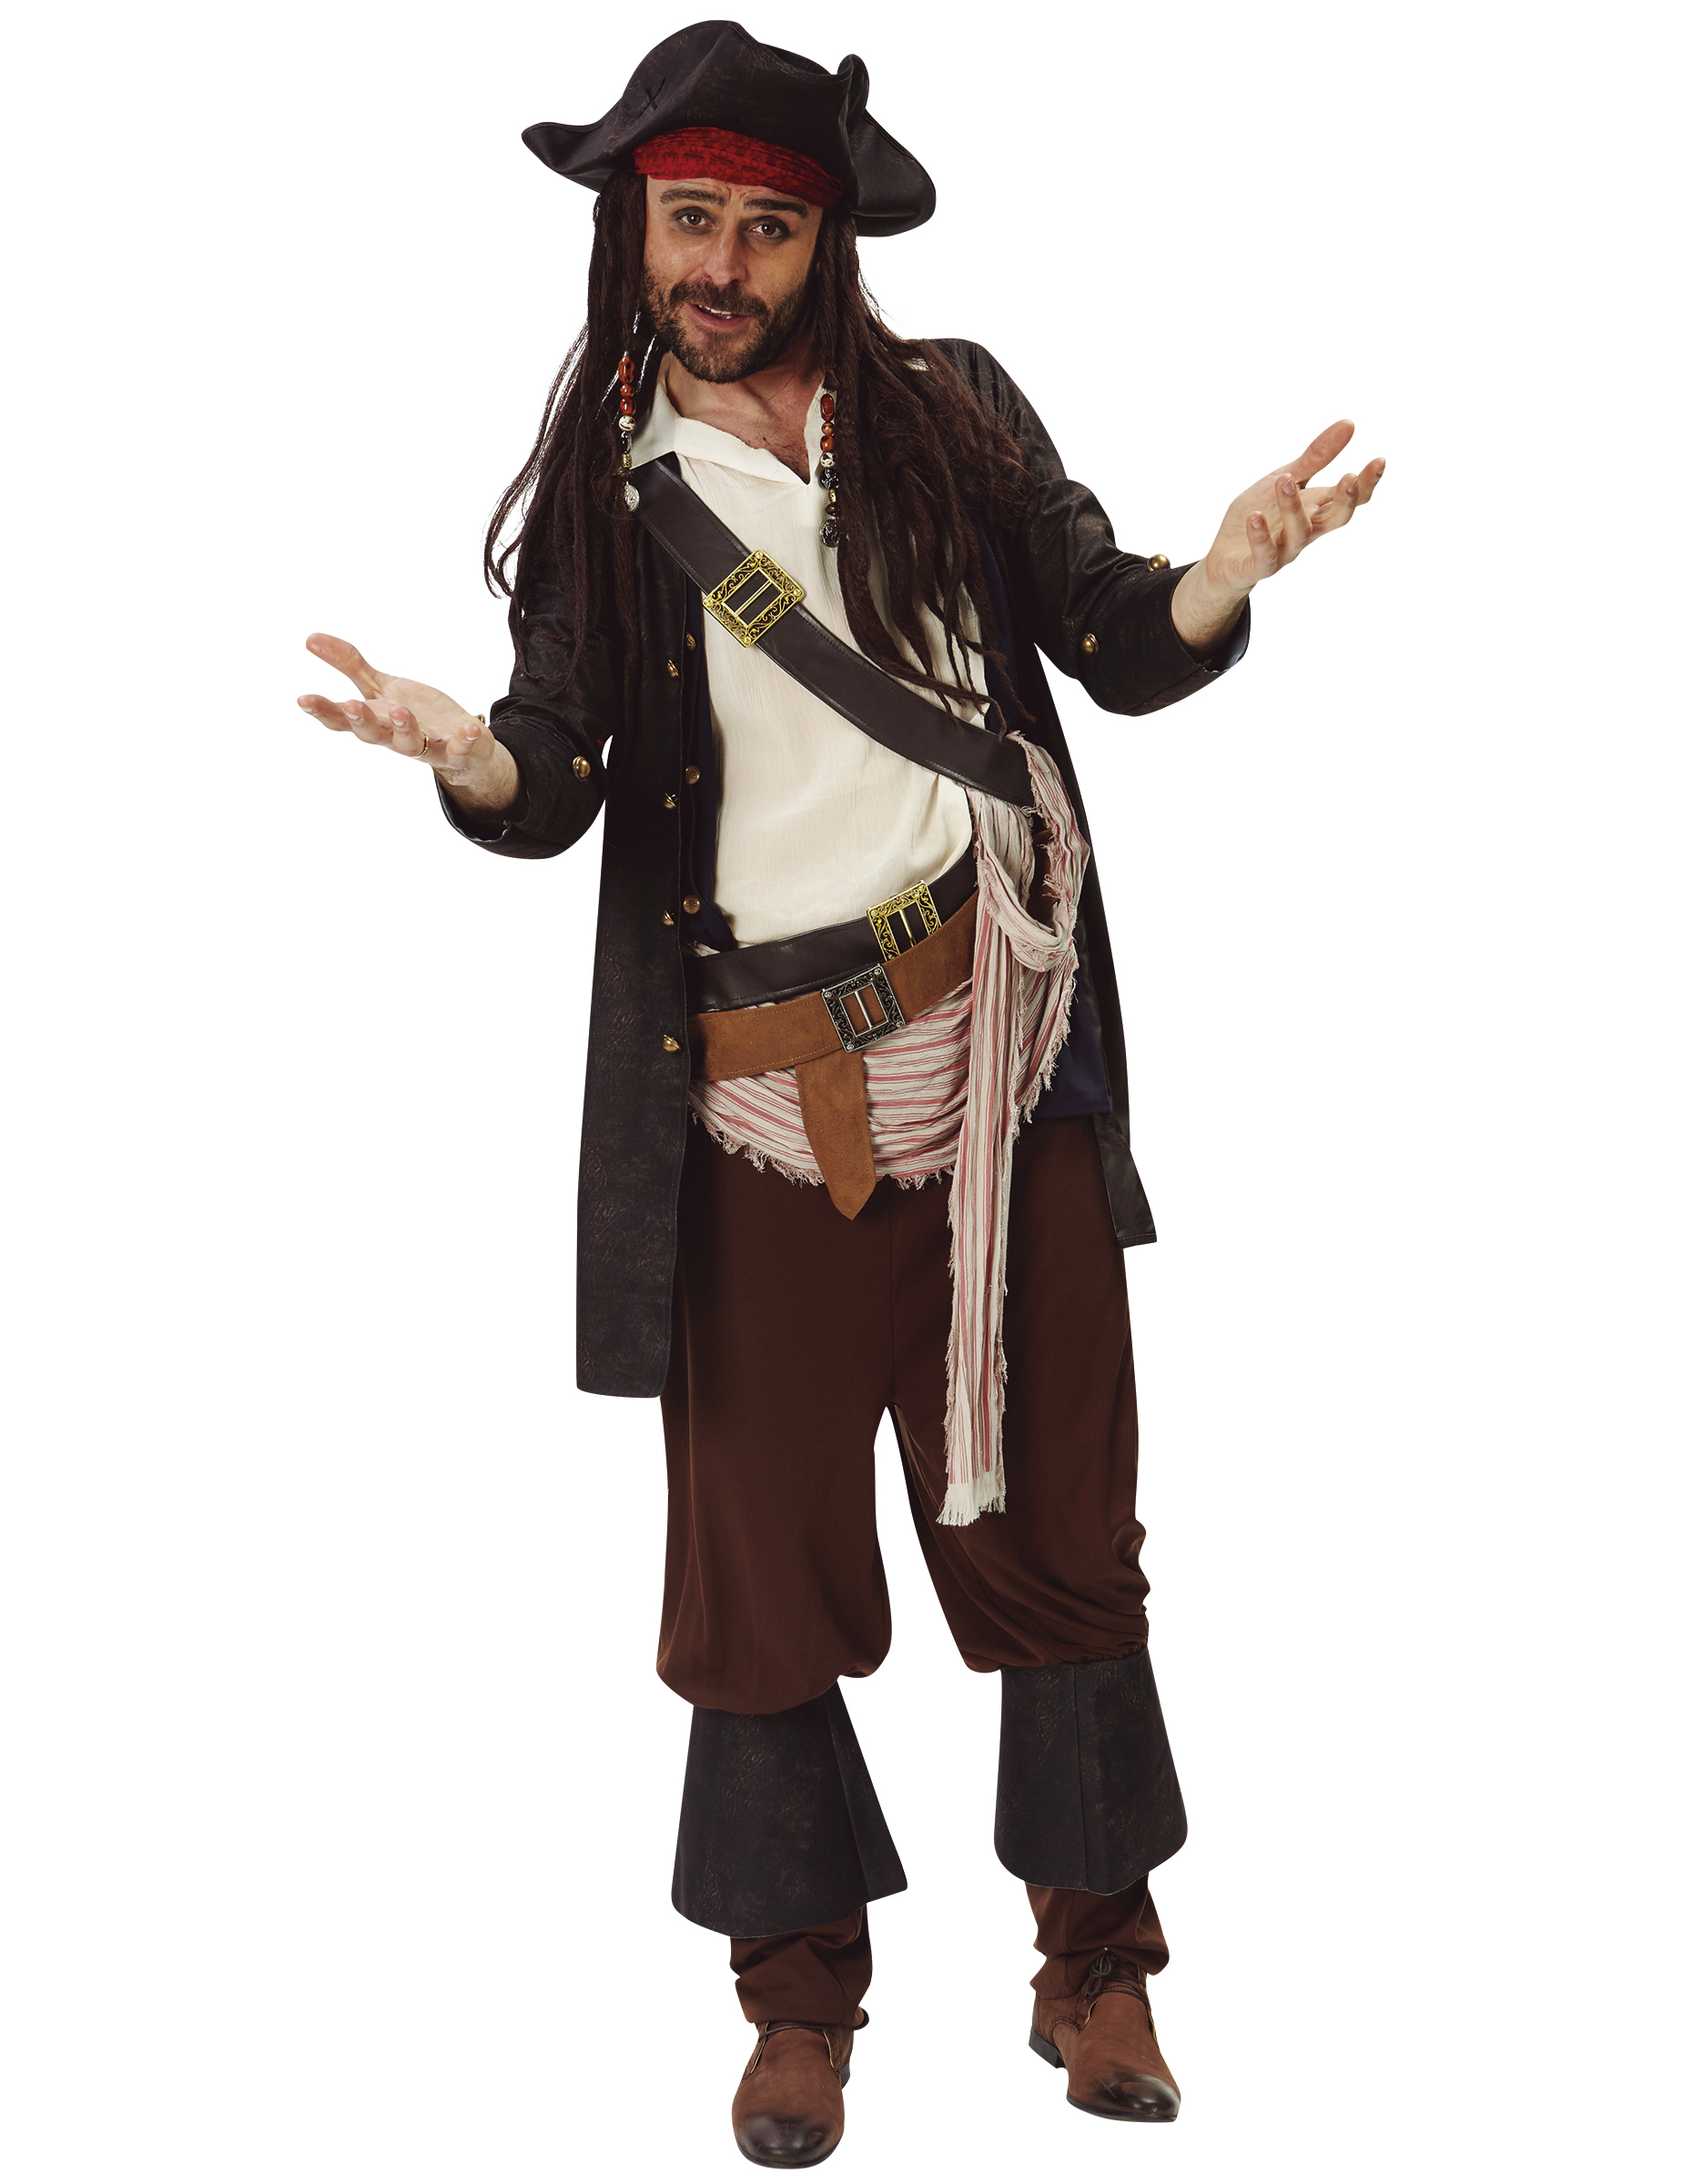 8307511ae2d5e Disfraz Jack Sparrow™ - Piratas del Caribe™  Disfraces adultos